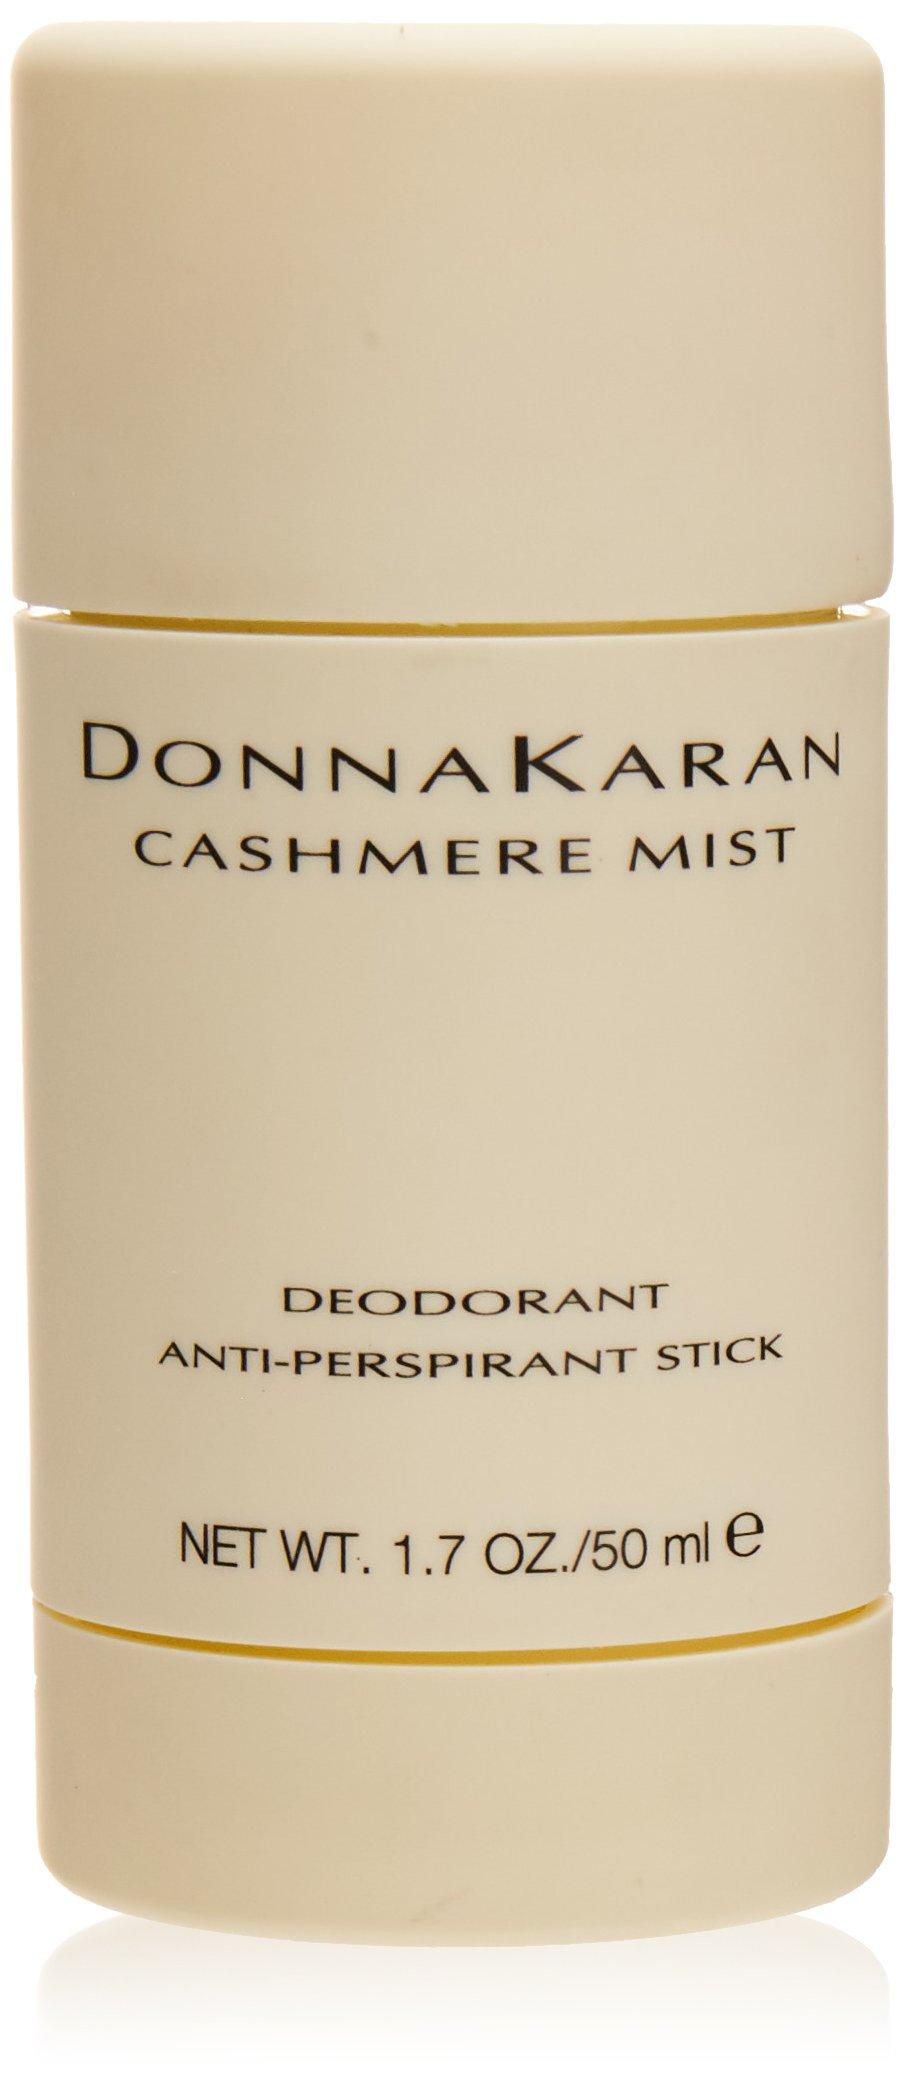 Donna Karan Cashmere Mist Anti-perspirant/Deodorant Stick For Women,1.7-Ounce